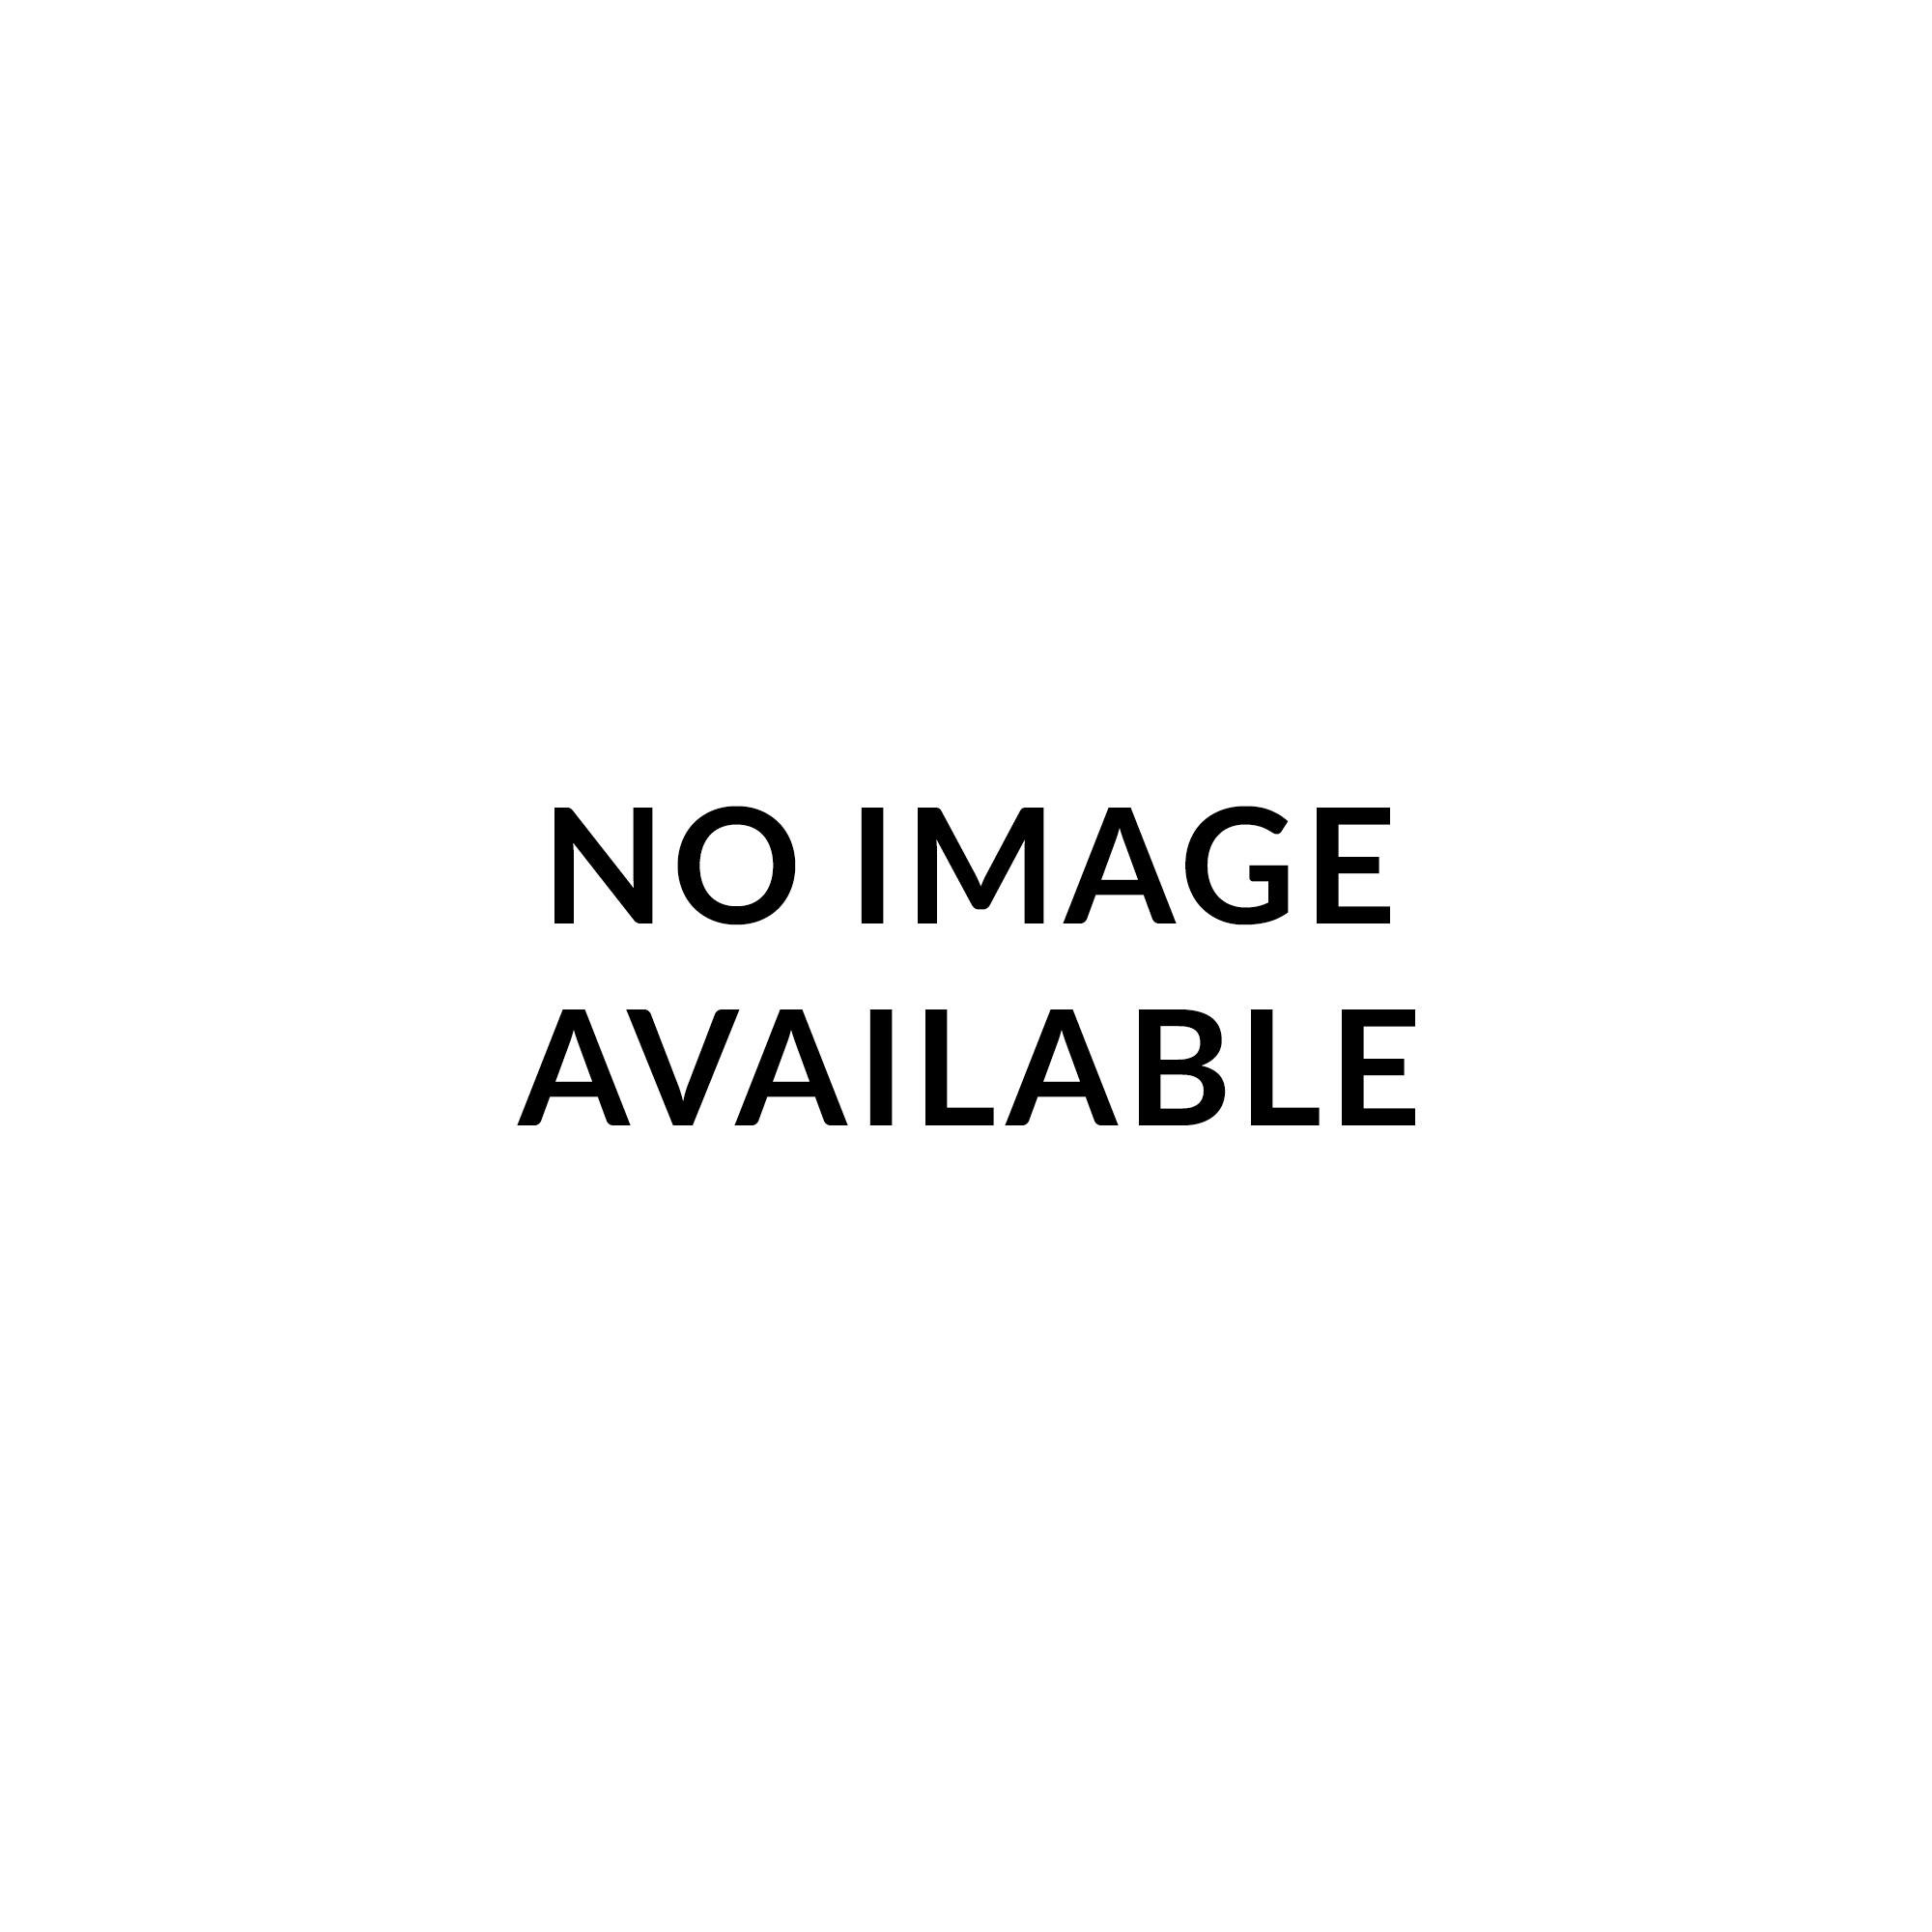 Seymour Duncan BLACKOUTS AS-1n Active Humbucker Pickup, Hot Strat, Neck, Black